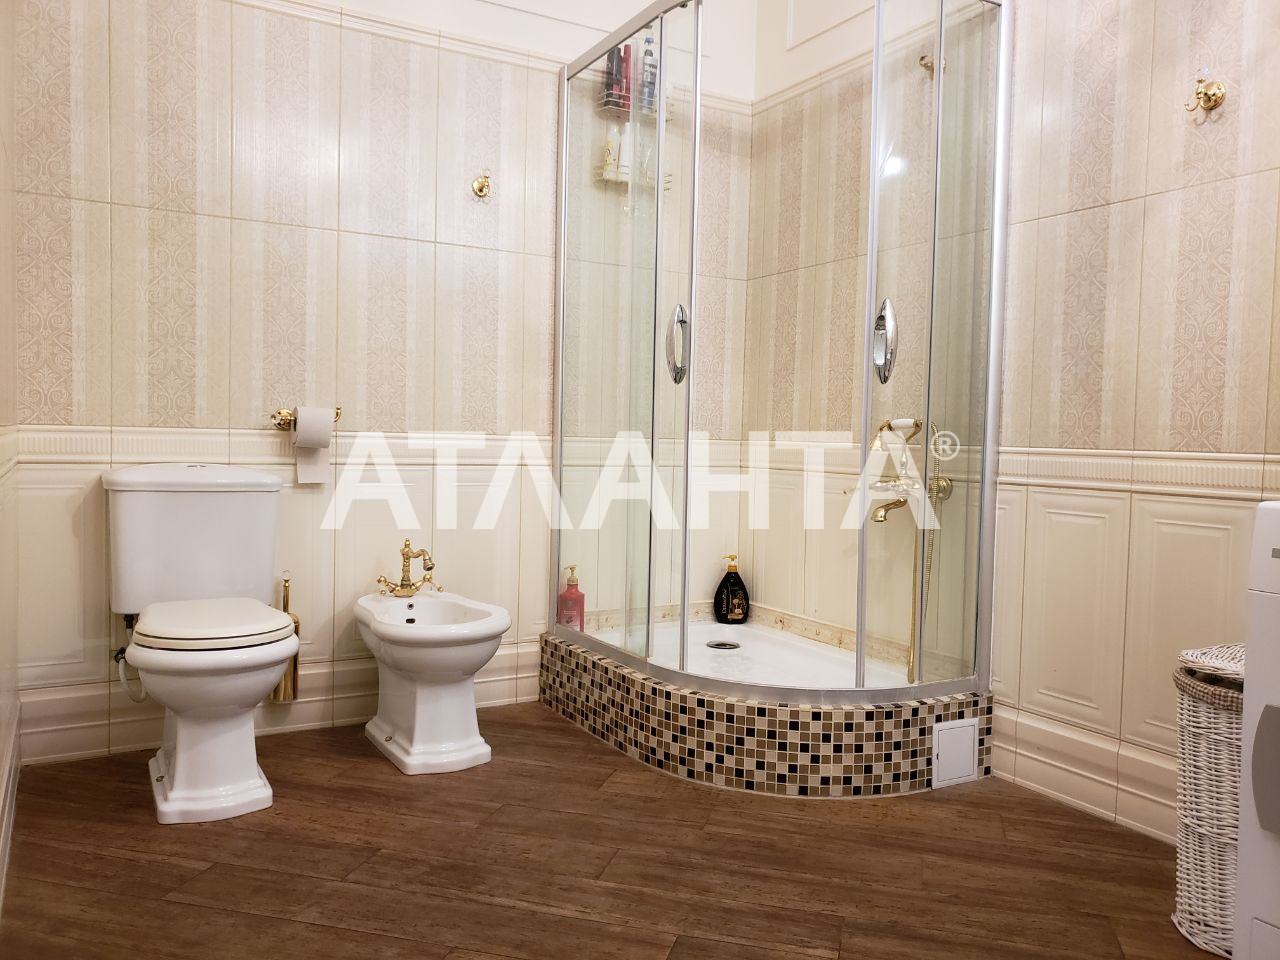 Продается 2-комнатная Квартира на ул. Генуэзская — 160 000 у.е. (фото №5)